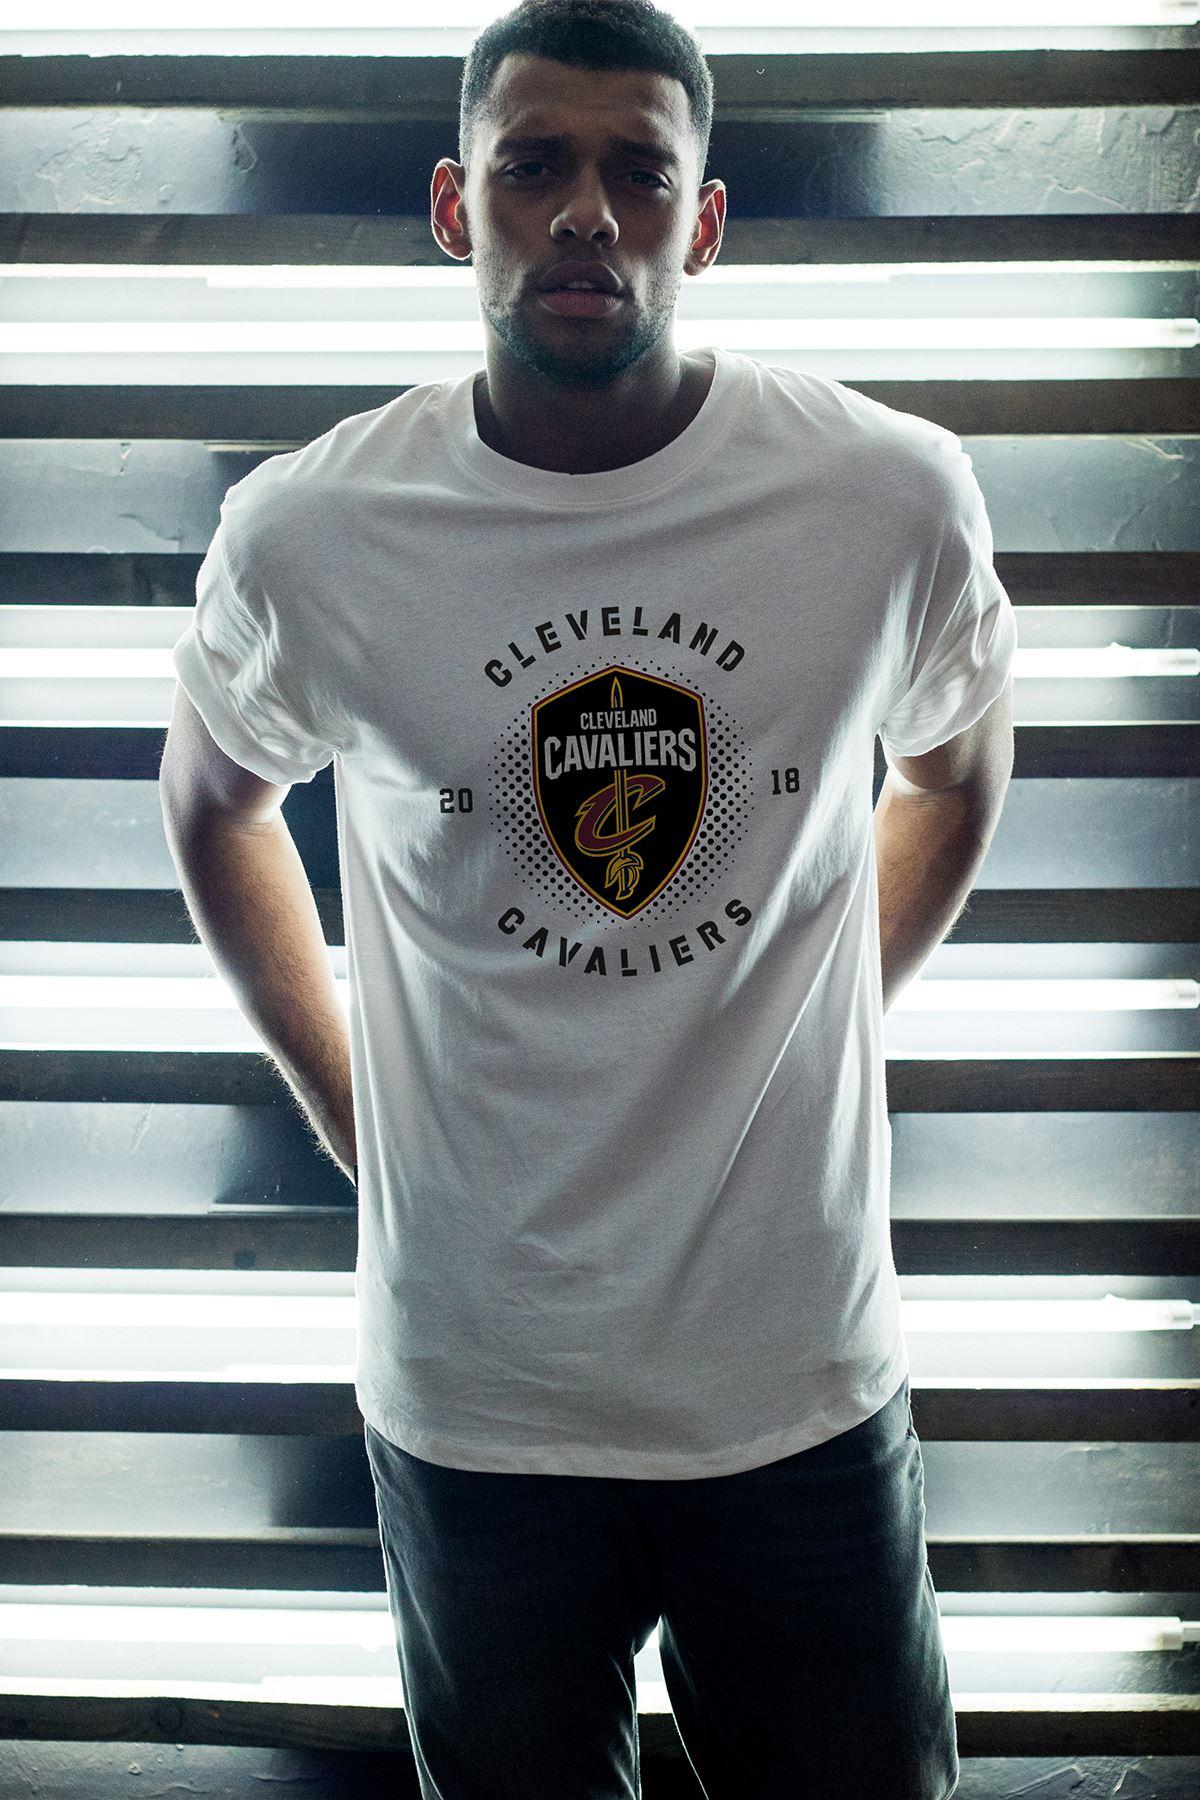 Cleveland 04 Beyaz Erkek Oversize Tshirt - Tişört